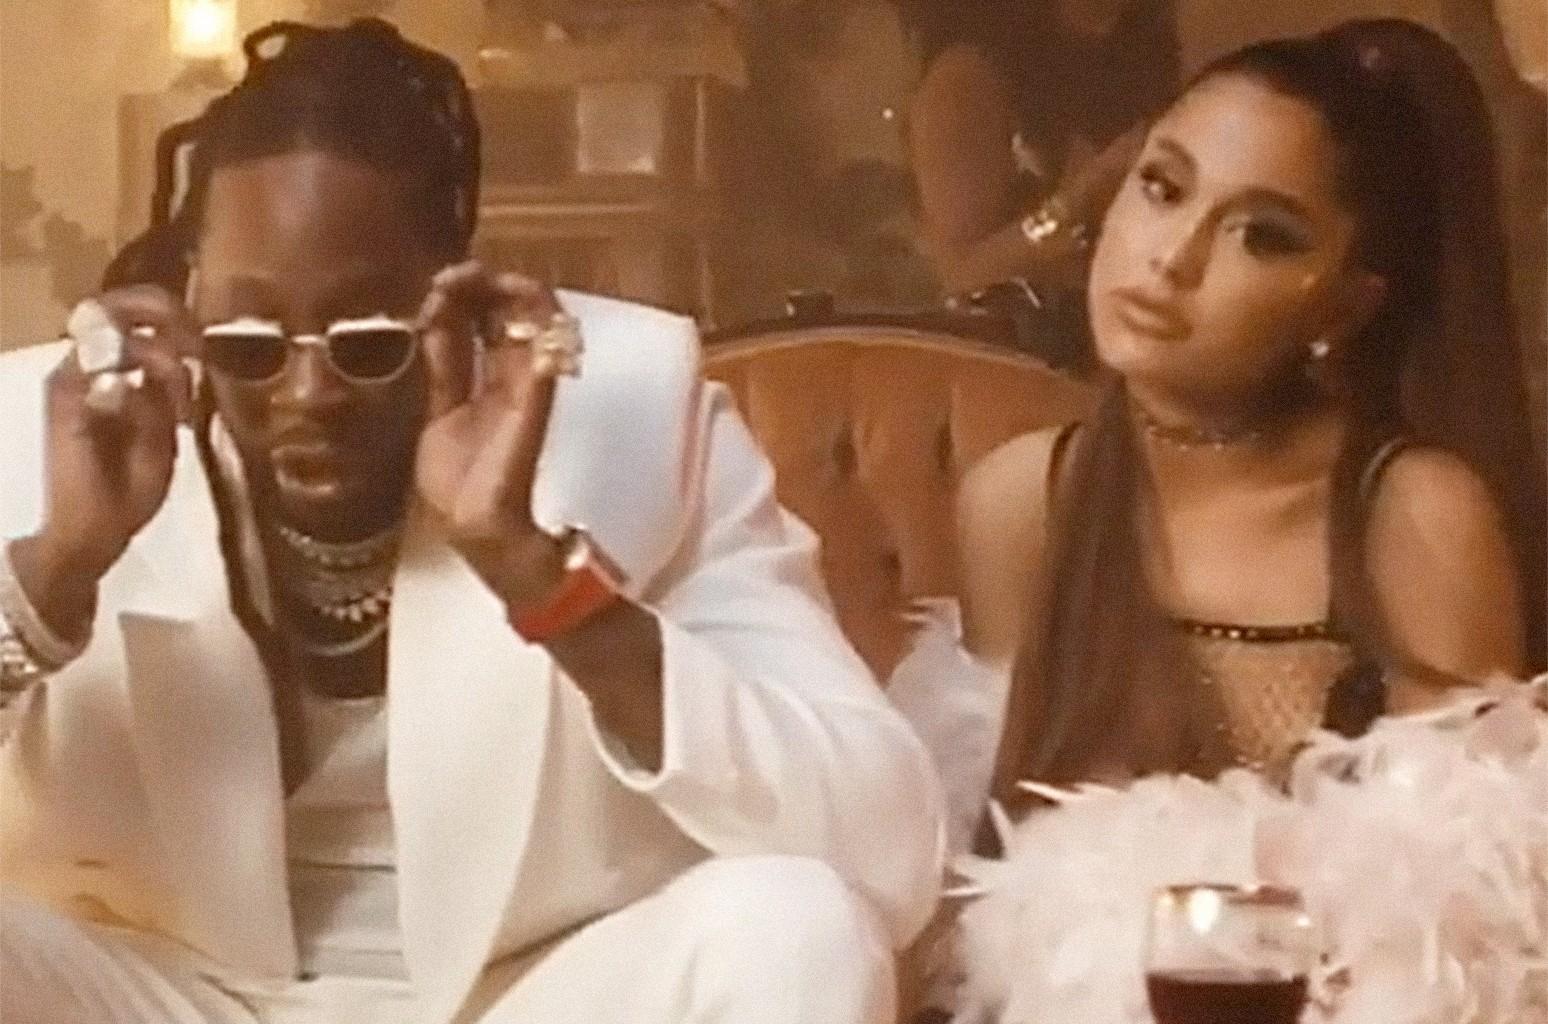 2 Chainz and Ariana Grander